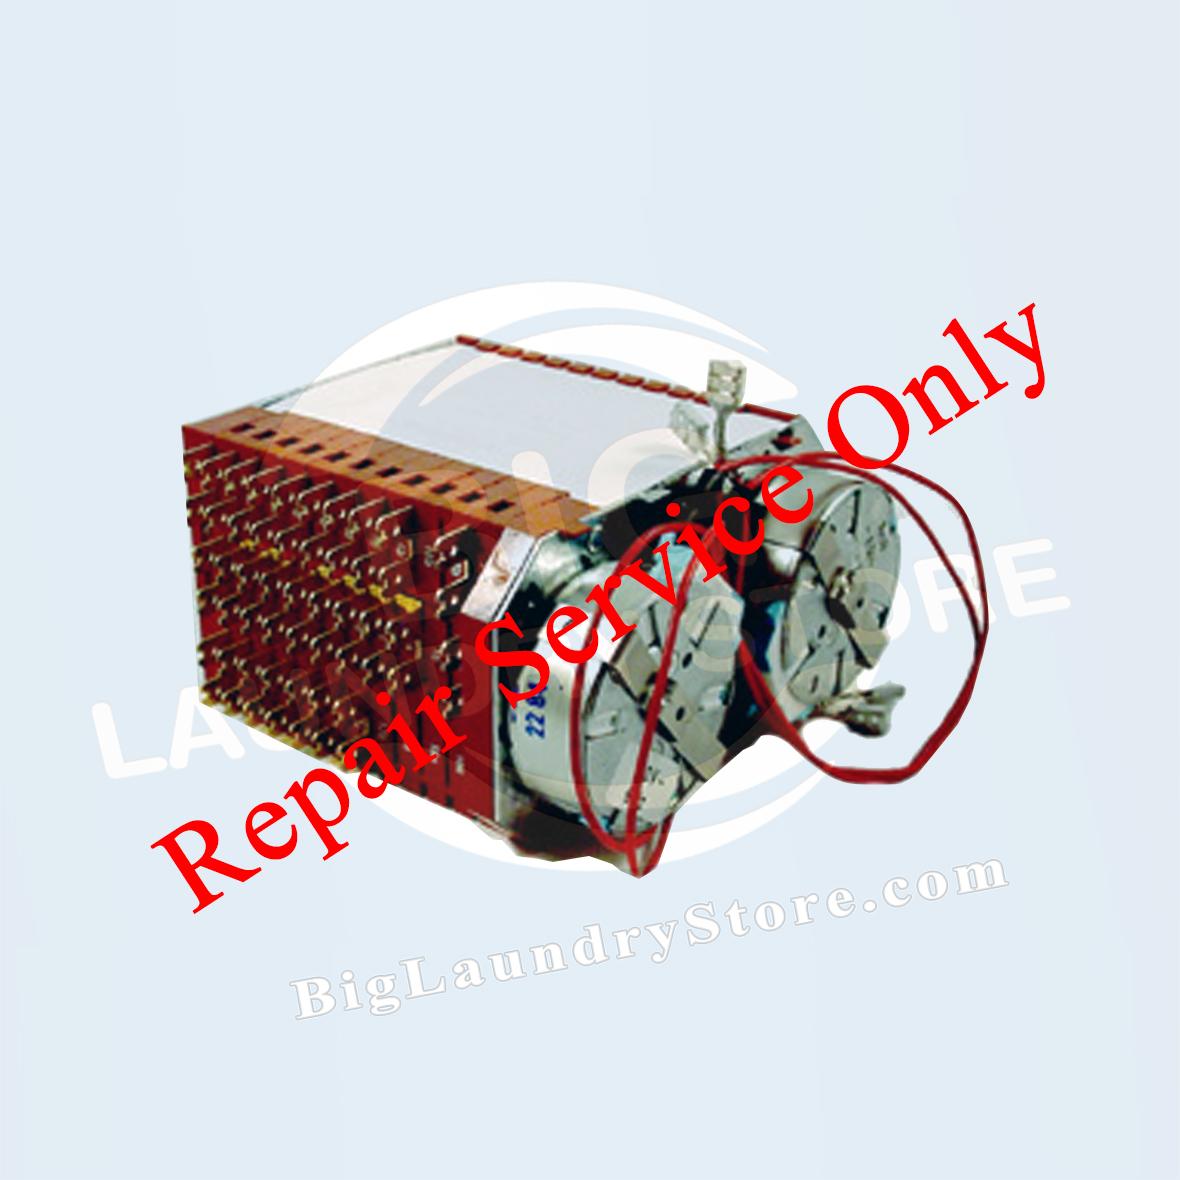 REPAIR - Huebsch, Speed Queen Unimac Timer # F160301P Repair